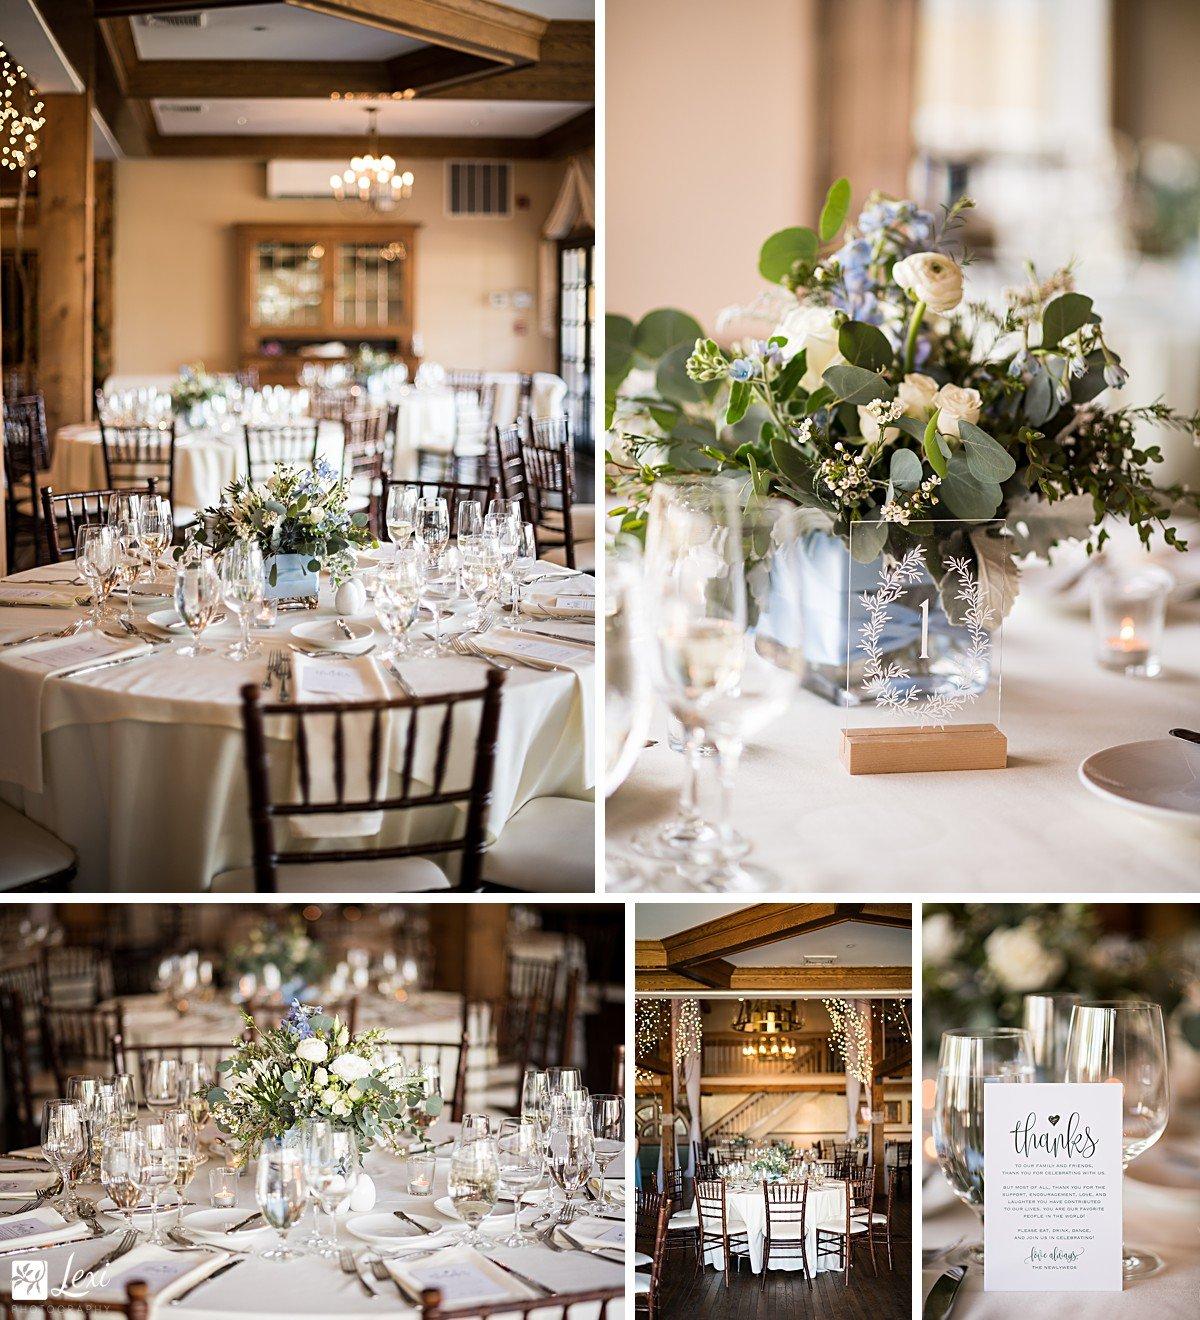 bedford-village-inn-wedding_table-details.jpg